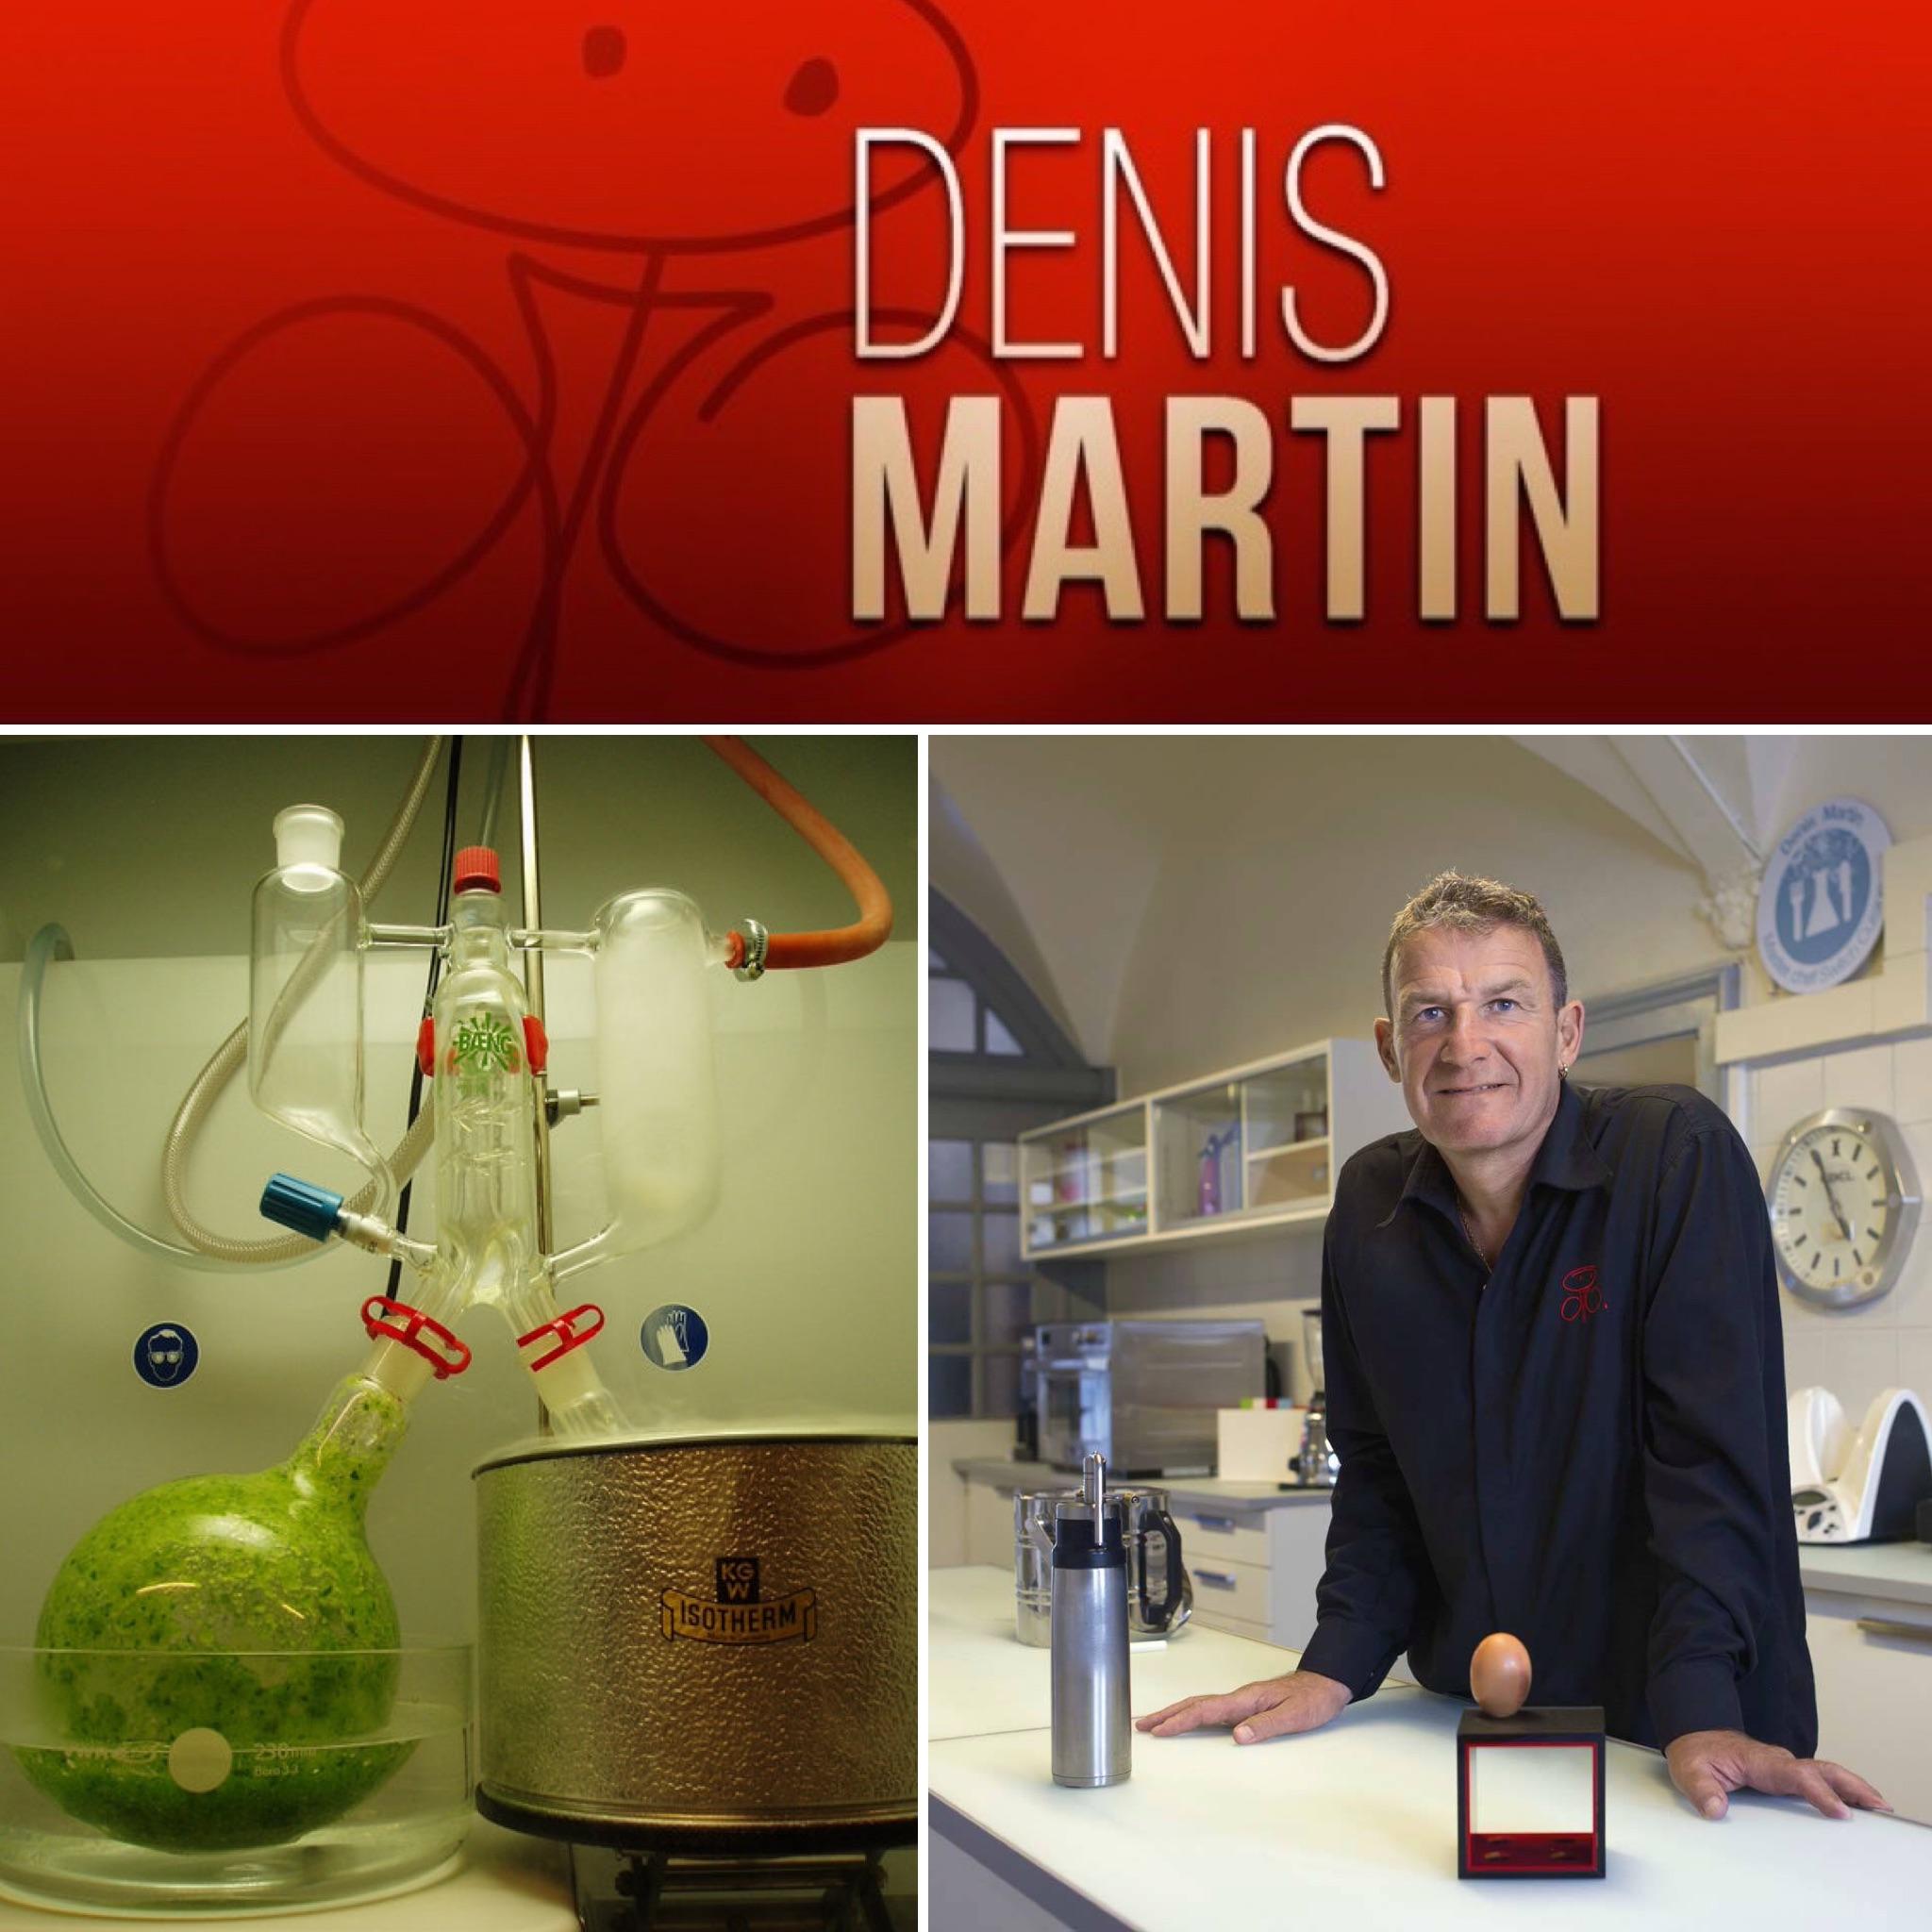 Denis_Martin_Bon_-25734-JBYQ5.pdf